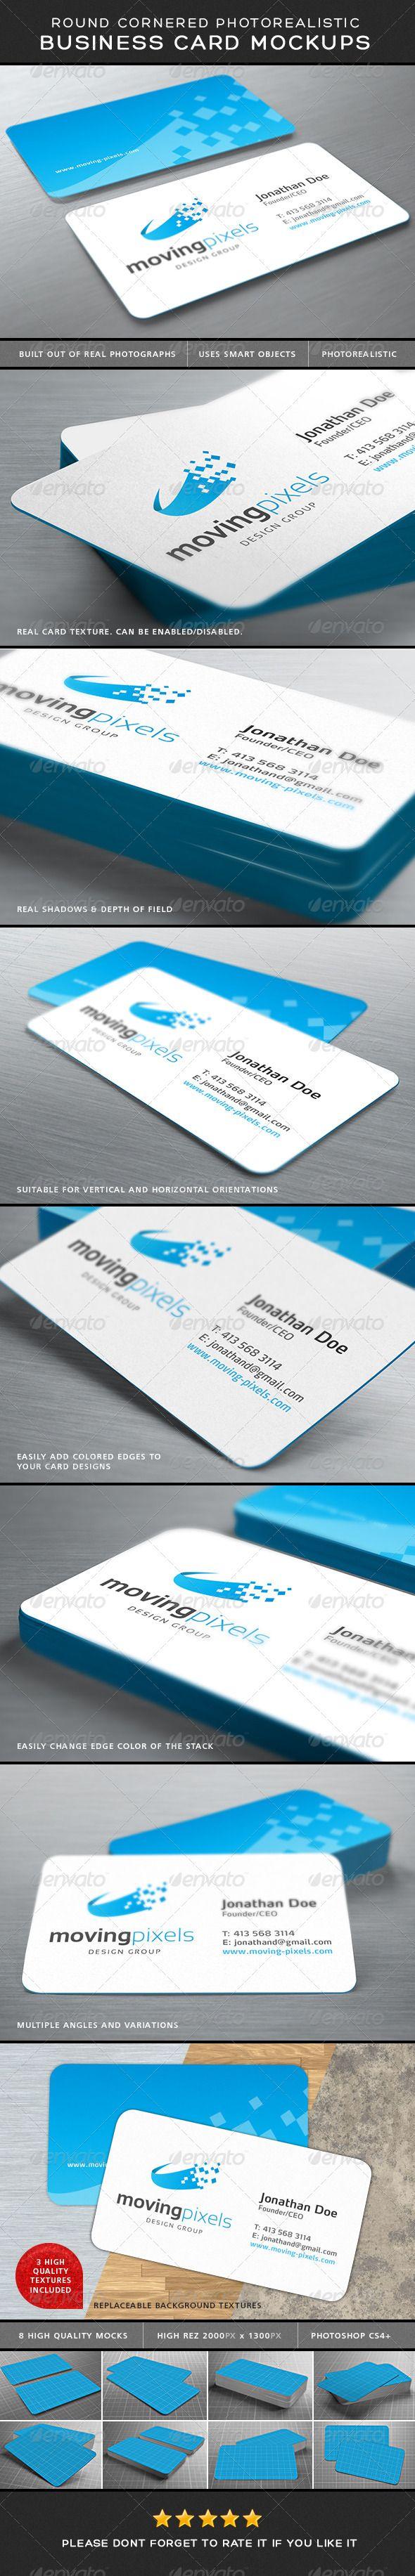 photorealistic business card mockup round corners mockup and